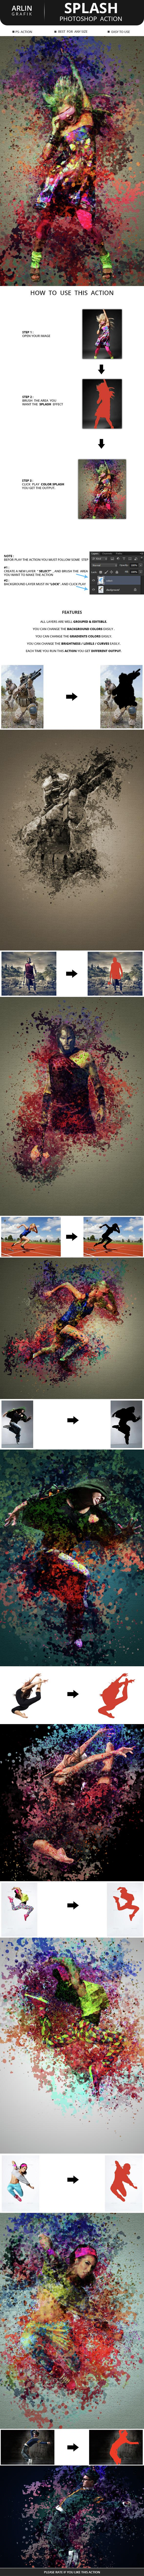 Splash Art Photoshop Action - Photo Effects Actions